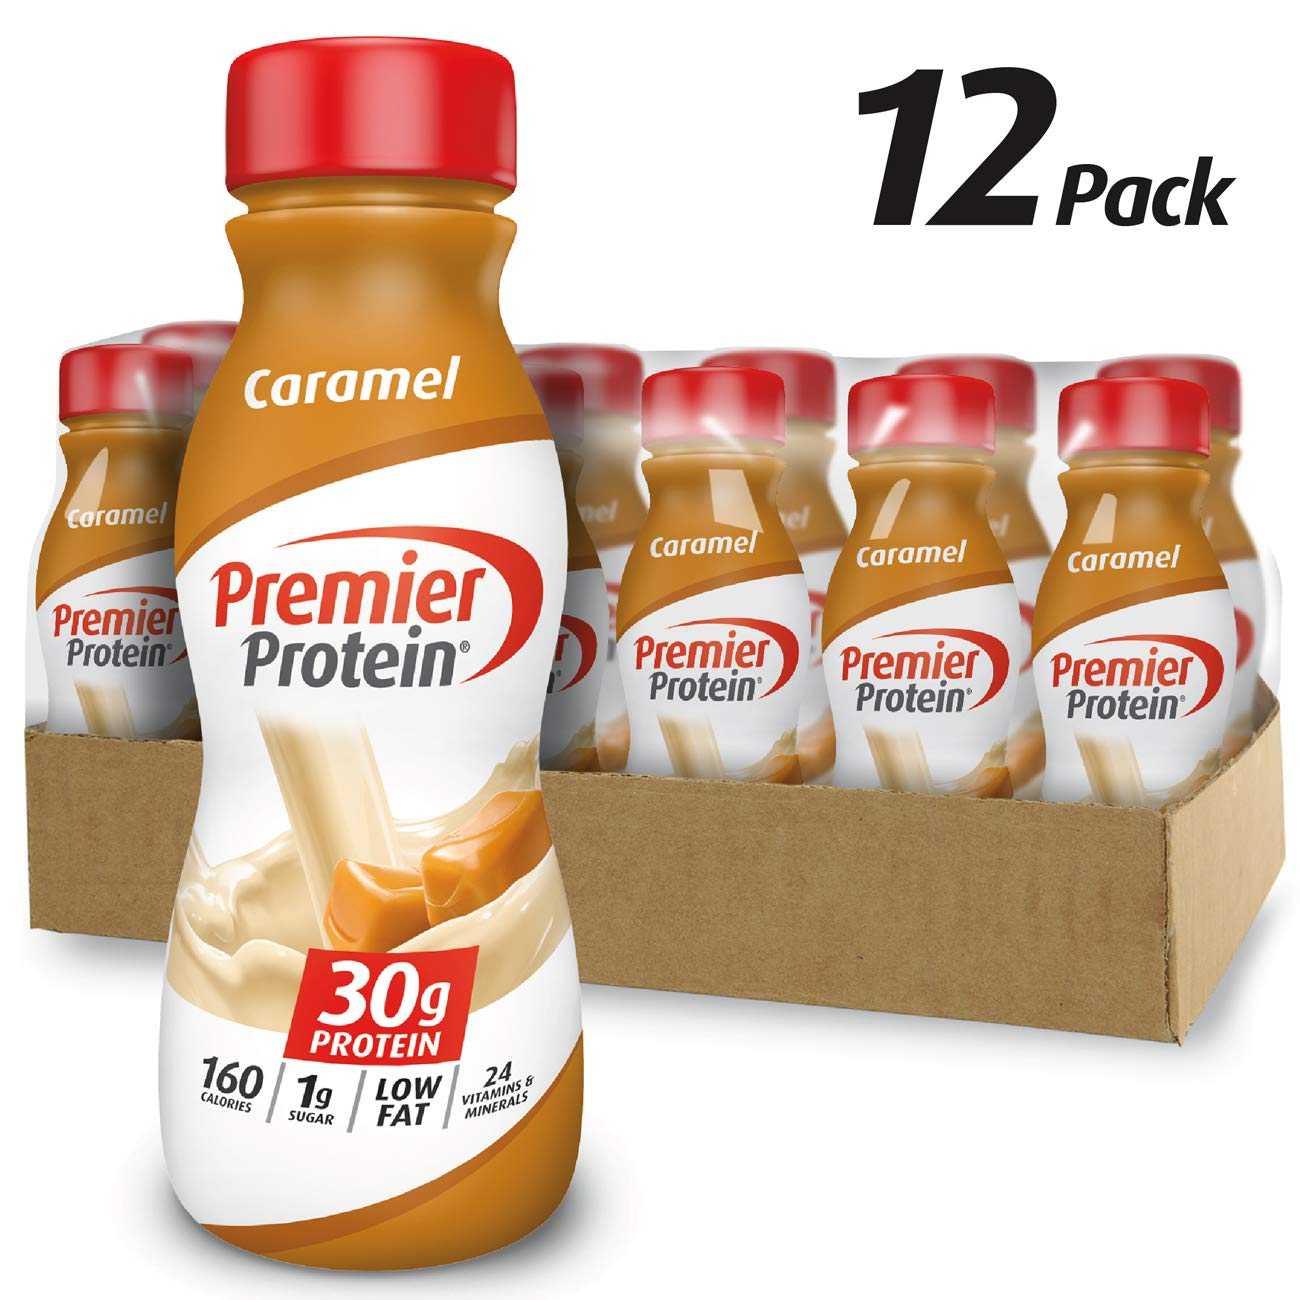 Premier Protein 30g Protein Shake, Caramel, 11.5 fl oz Shake, (12 count)